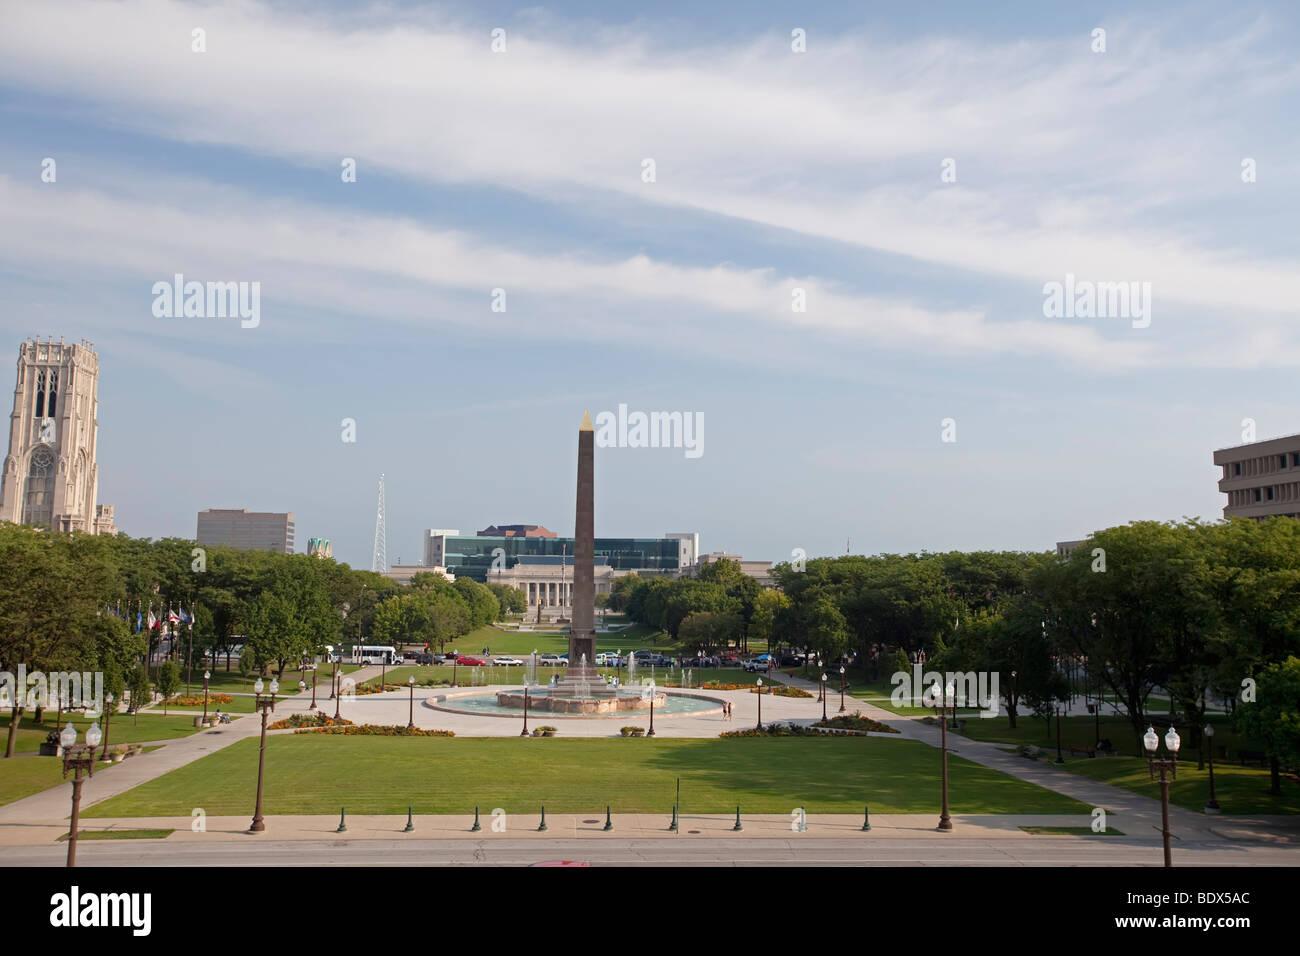 Indianapolis, Indiana - Veterans Memorial Plaza. - Stock Image